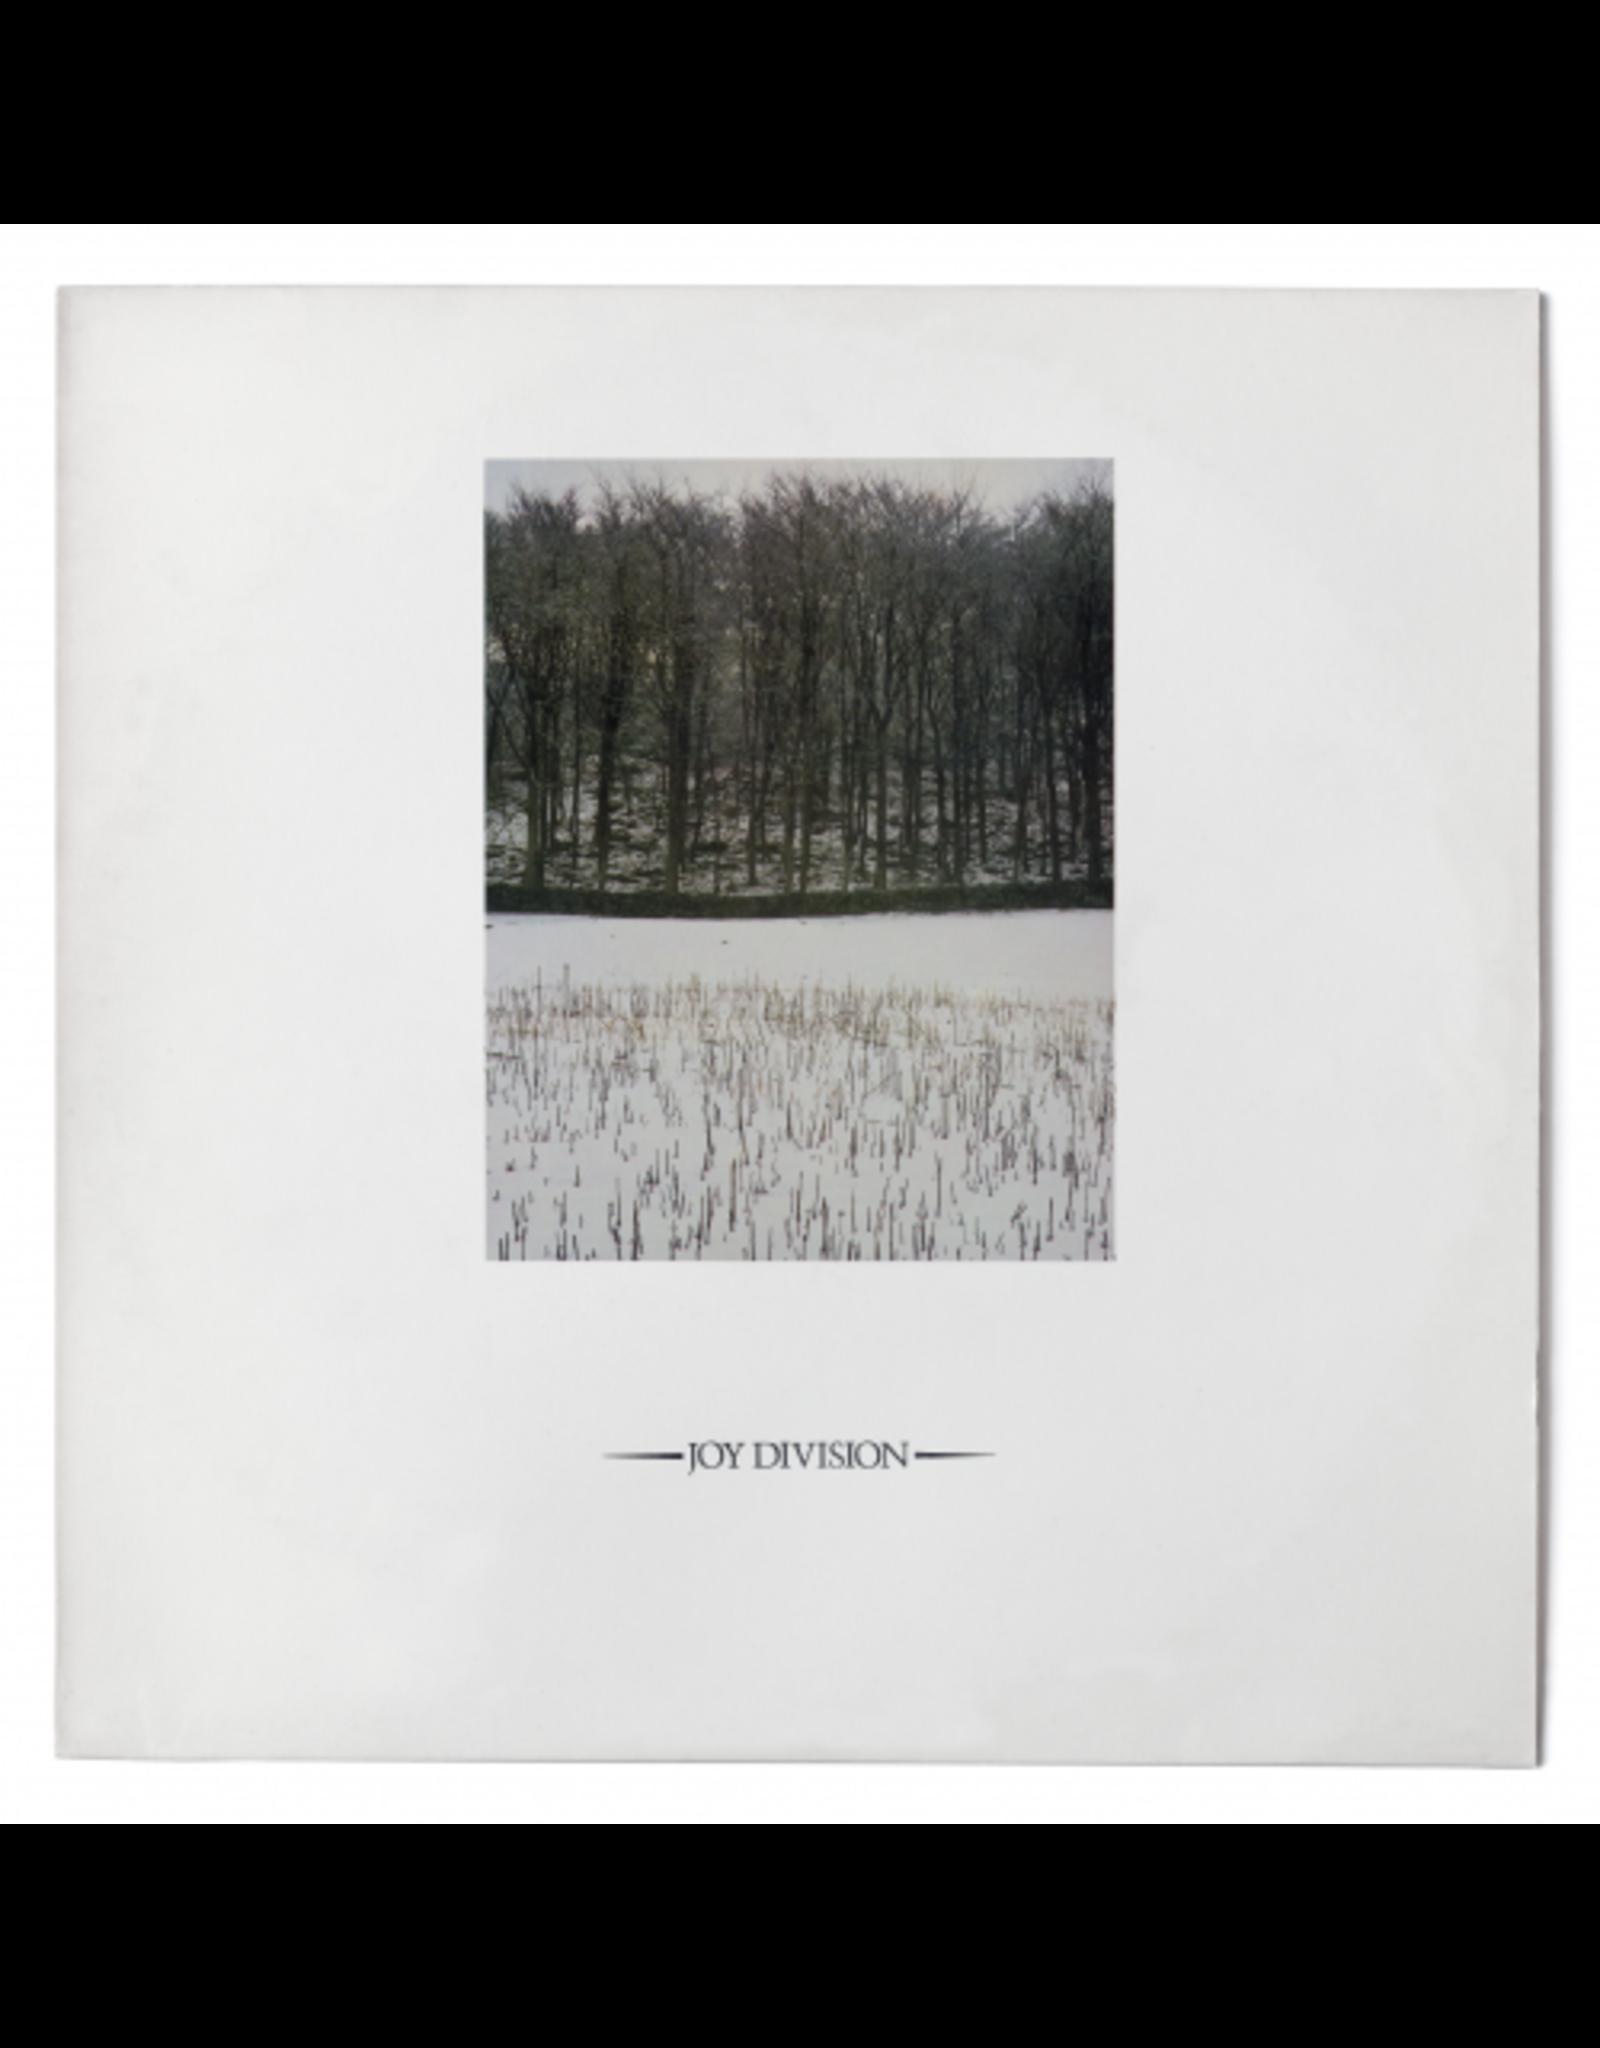 Joy Division - Atmosphere LP